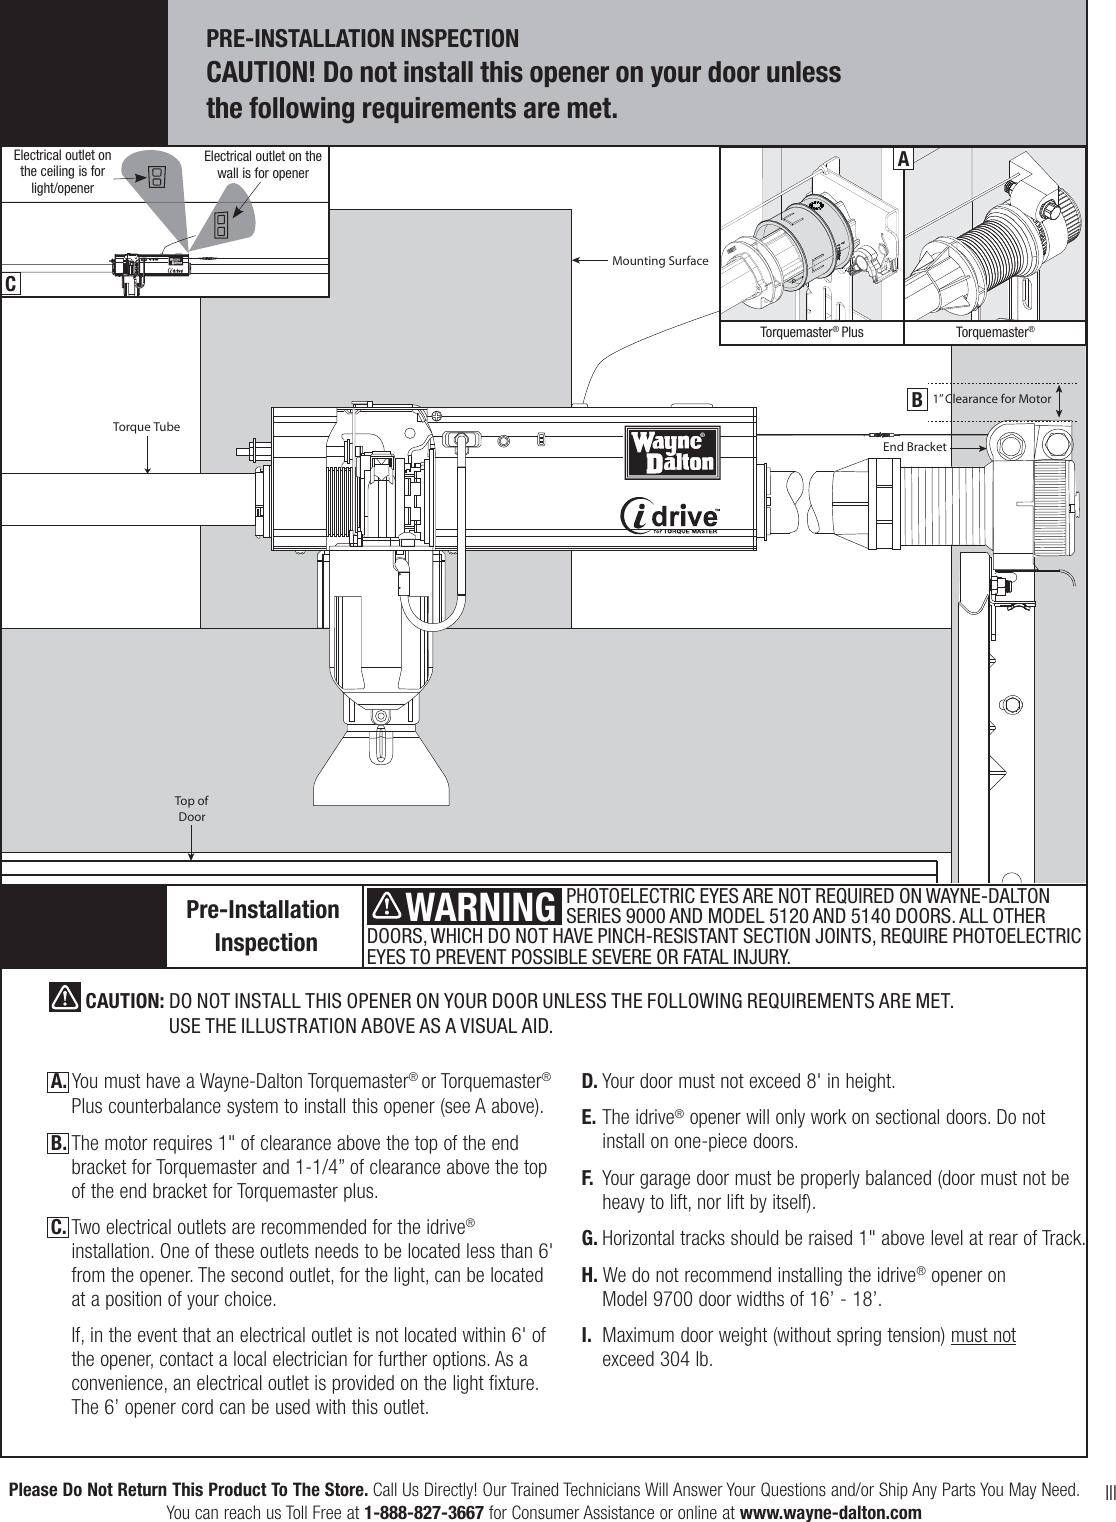 Wayne Dalton Torquemaster 3663 372 Users Manual 320687 Rev7